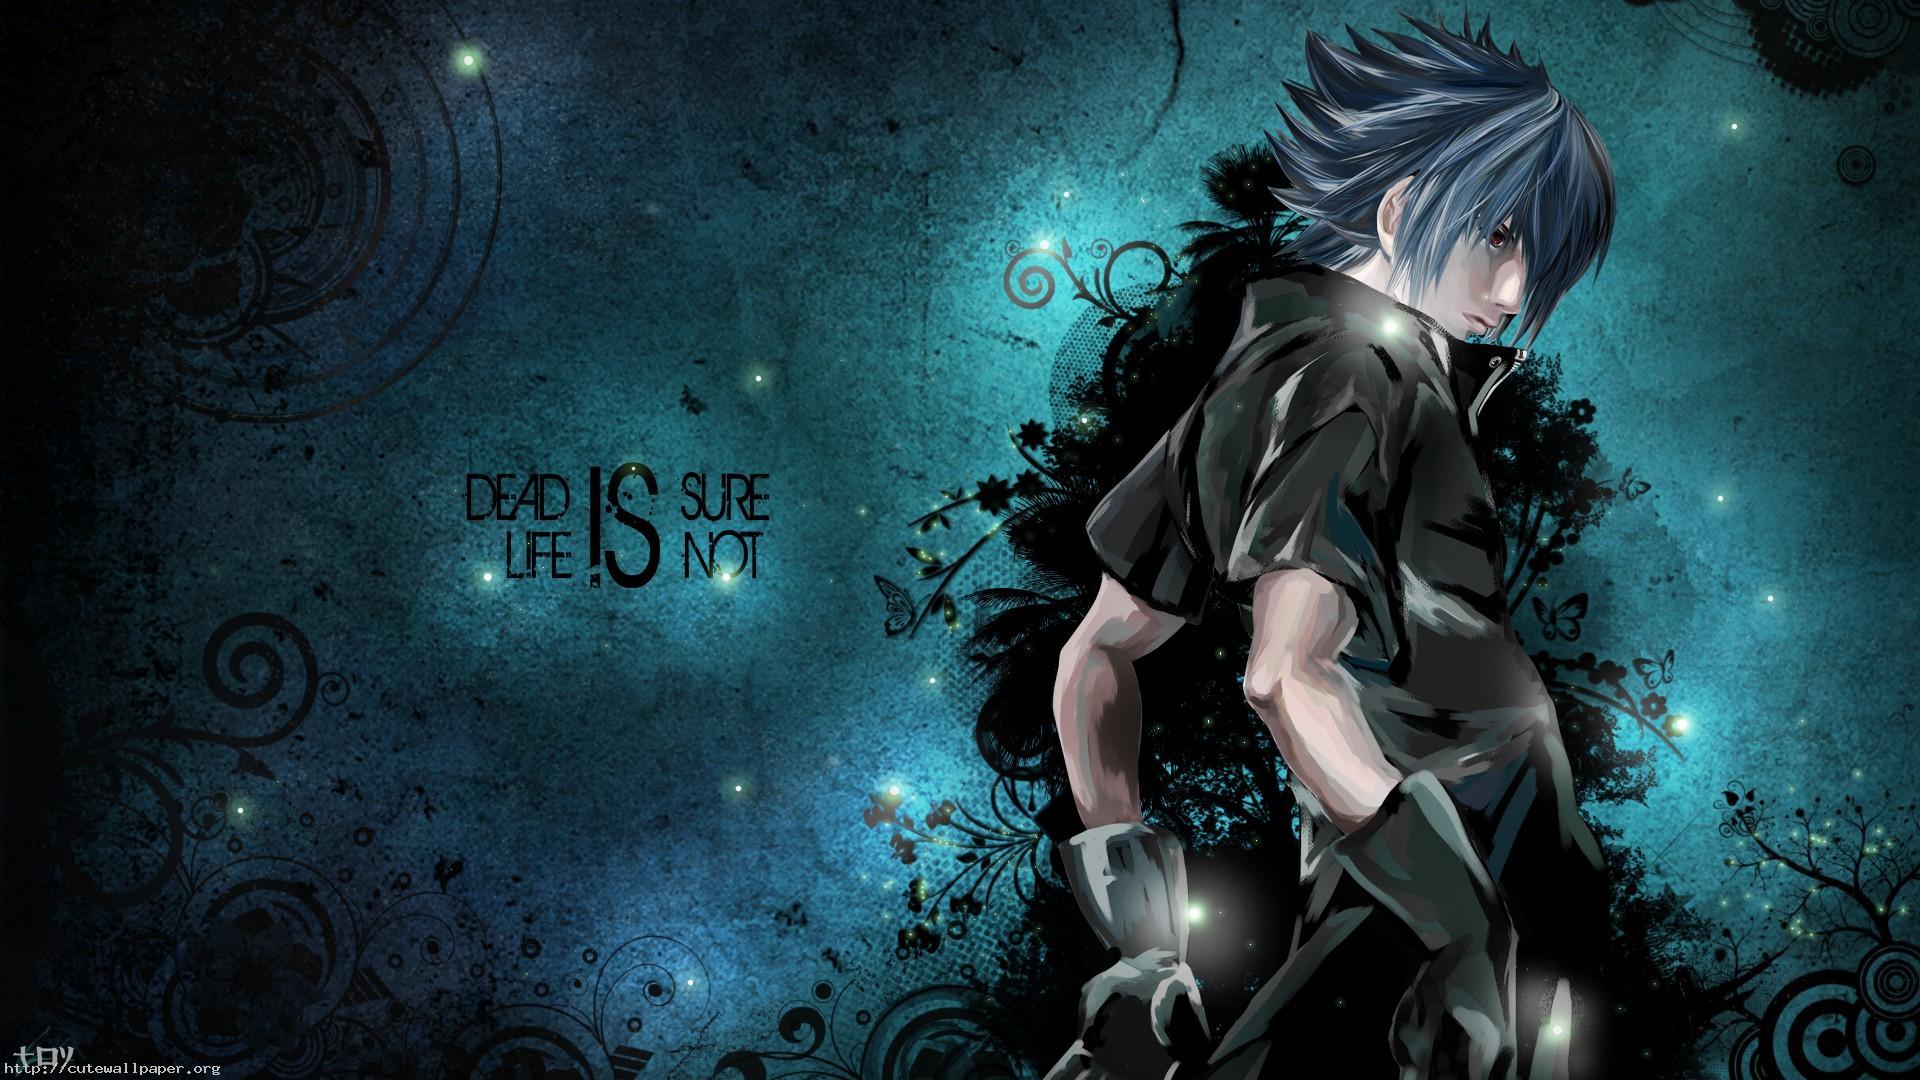 Download Free Final Fantasy Wallpapers 15 Beautiful: Final Fantasy 15 Fond D'écran HD